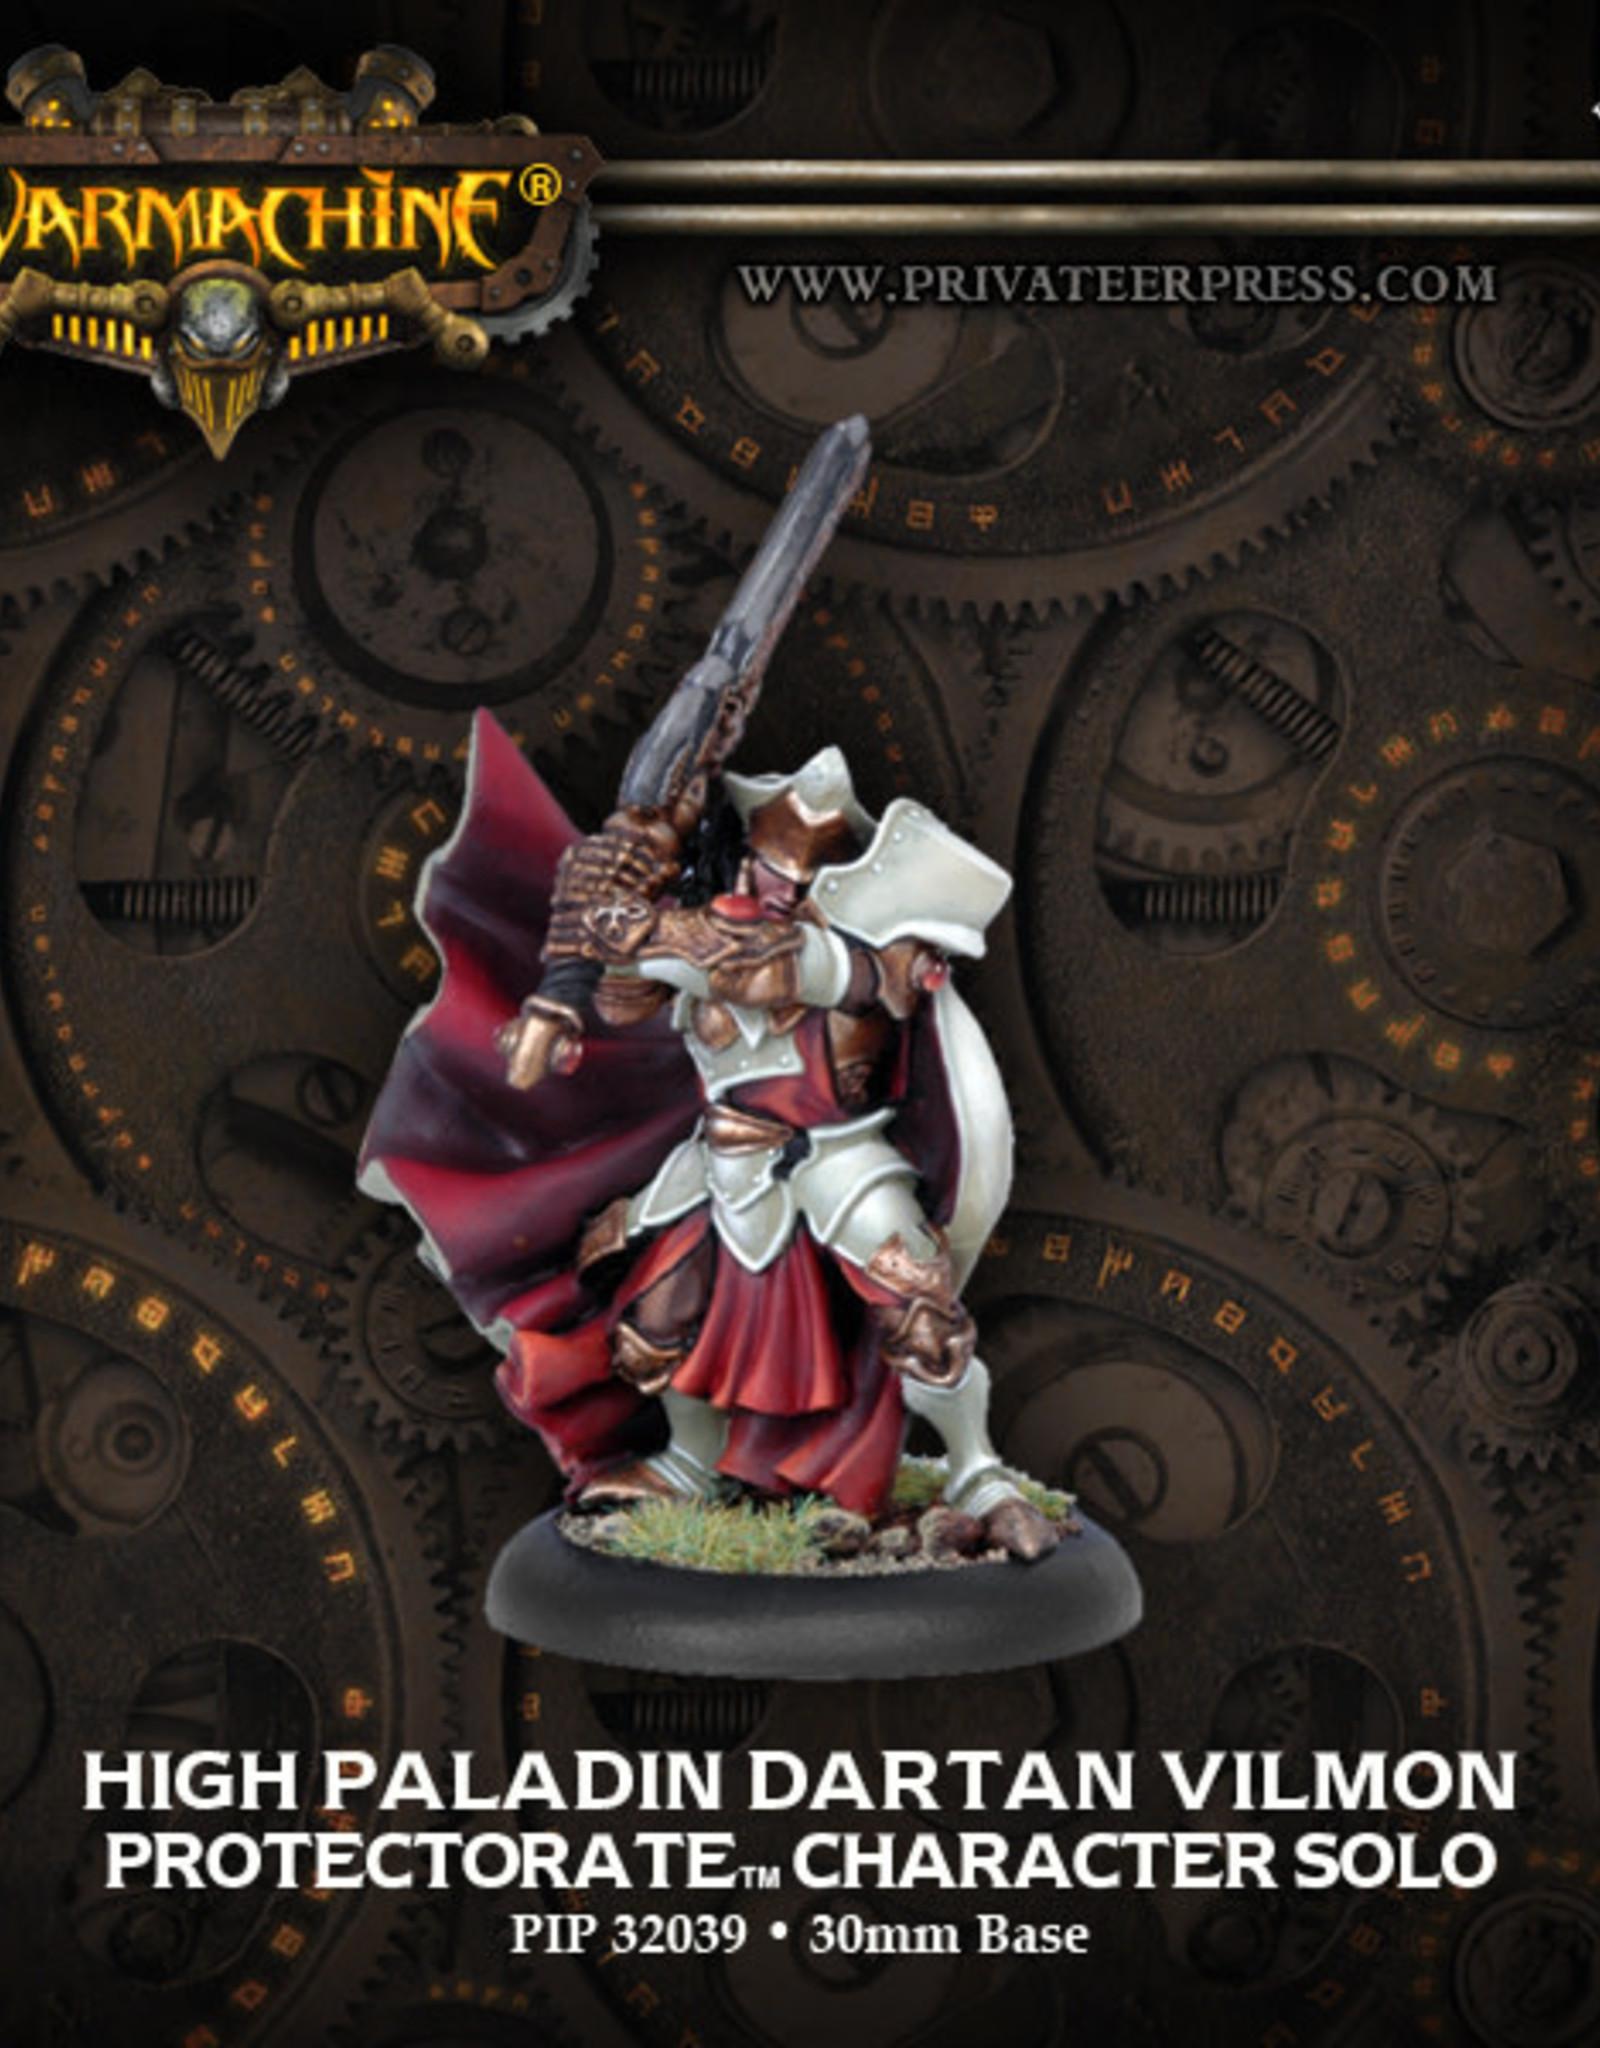 Warmachine Protectorate - High Paladin Dartan Vilmon